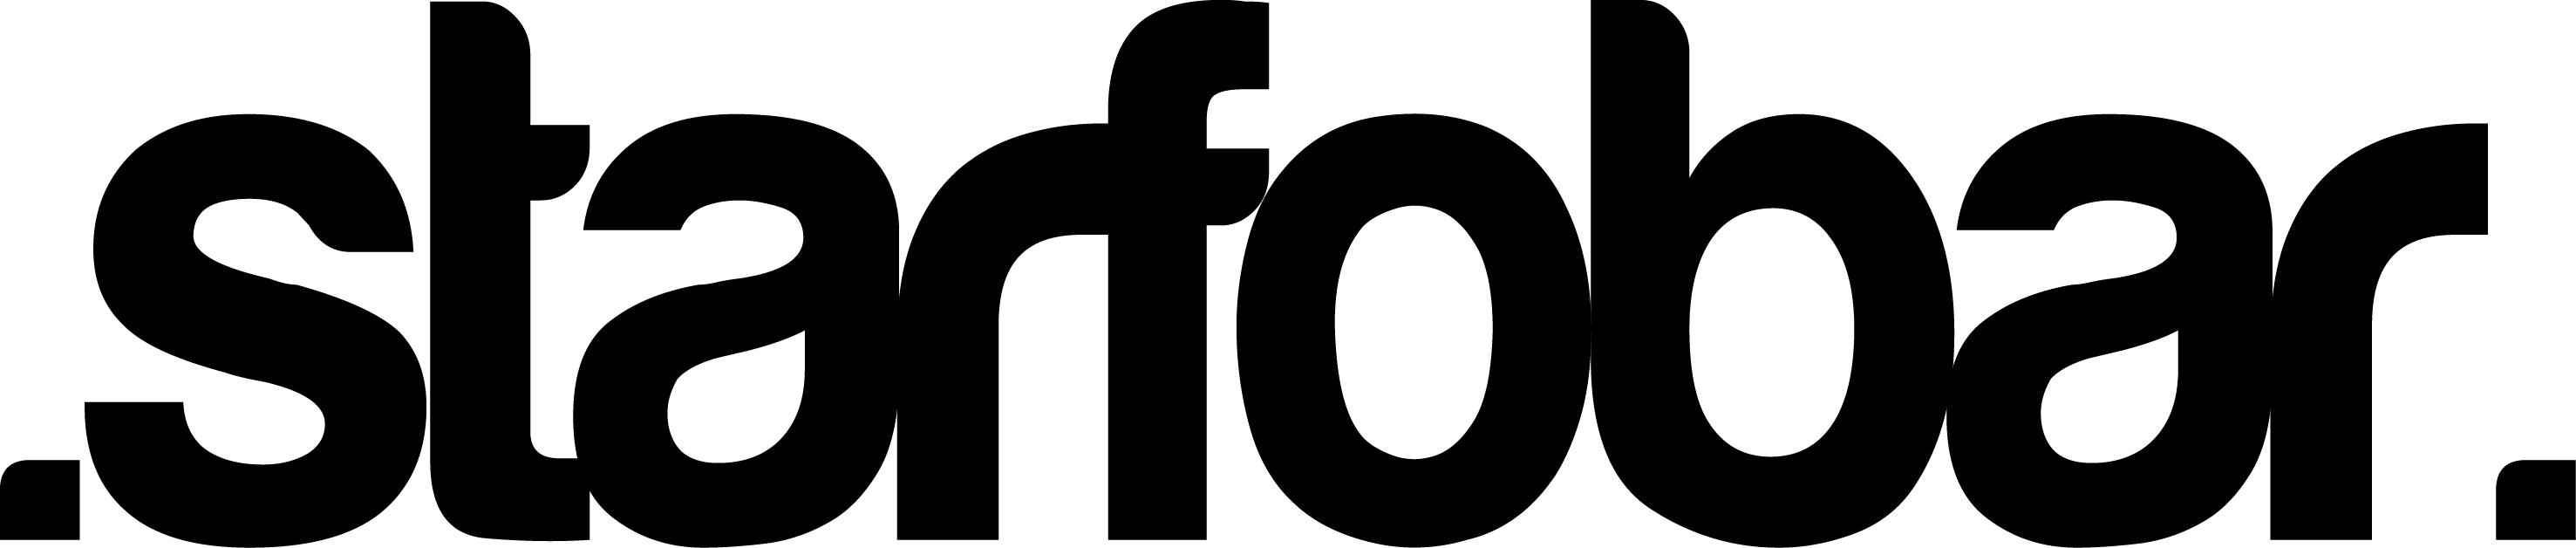 Starfobar